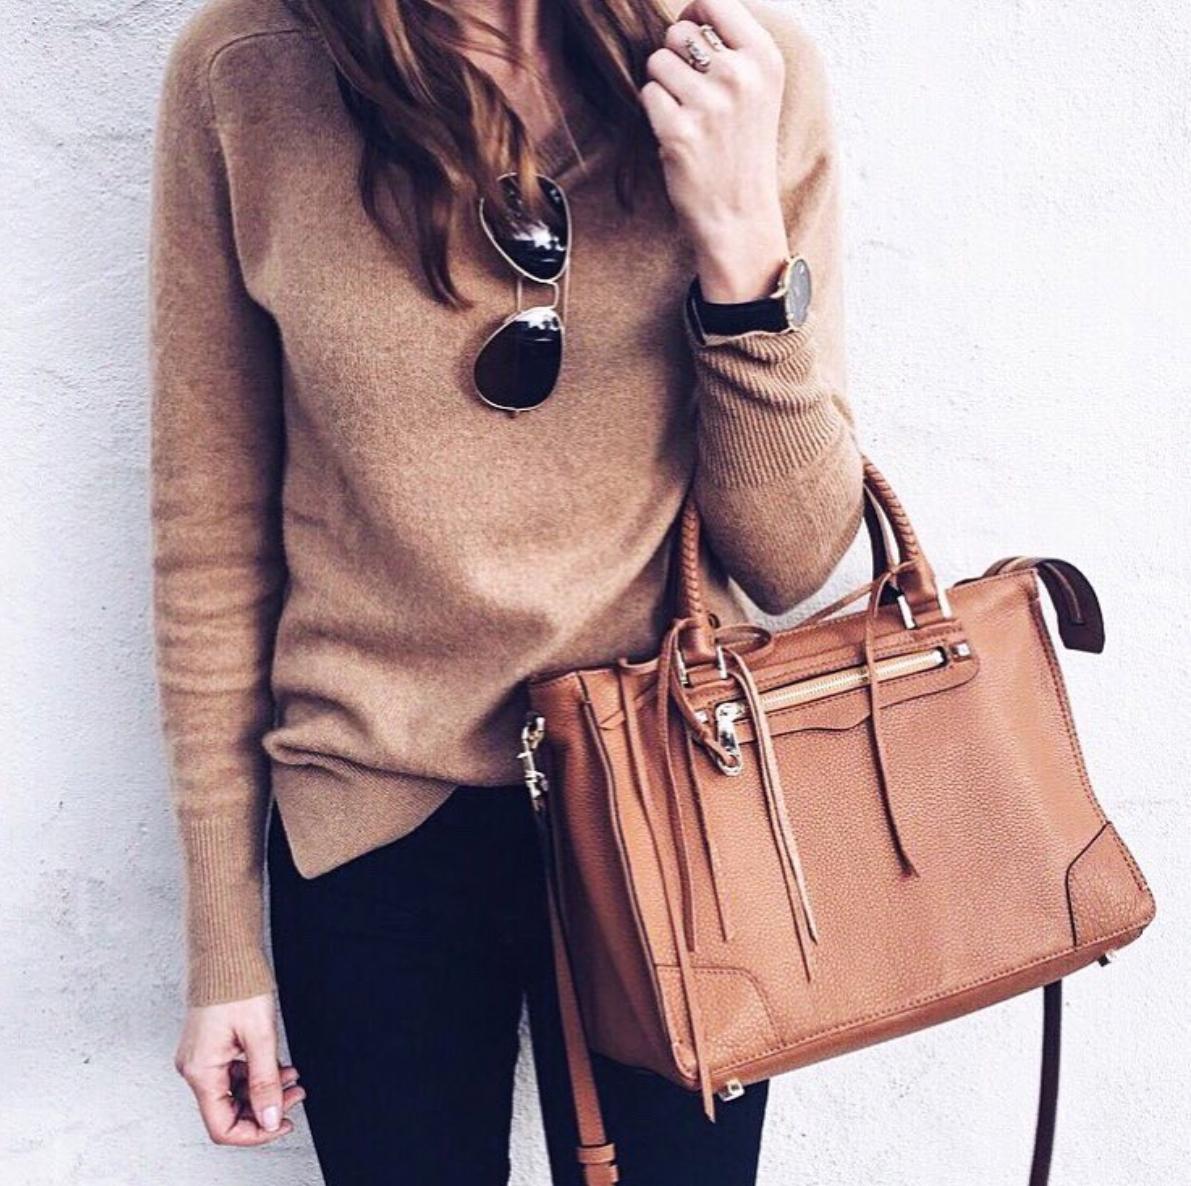 Cashmere Sweater |  Rebecca Minkoff Bag  - on sale!